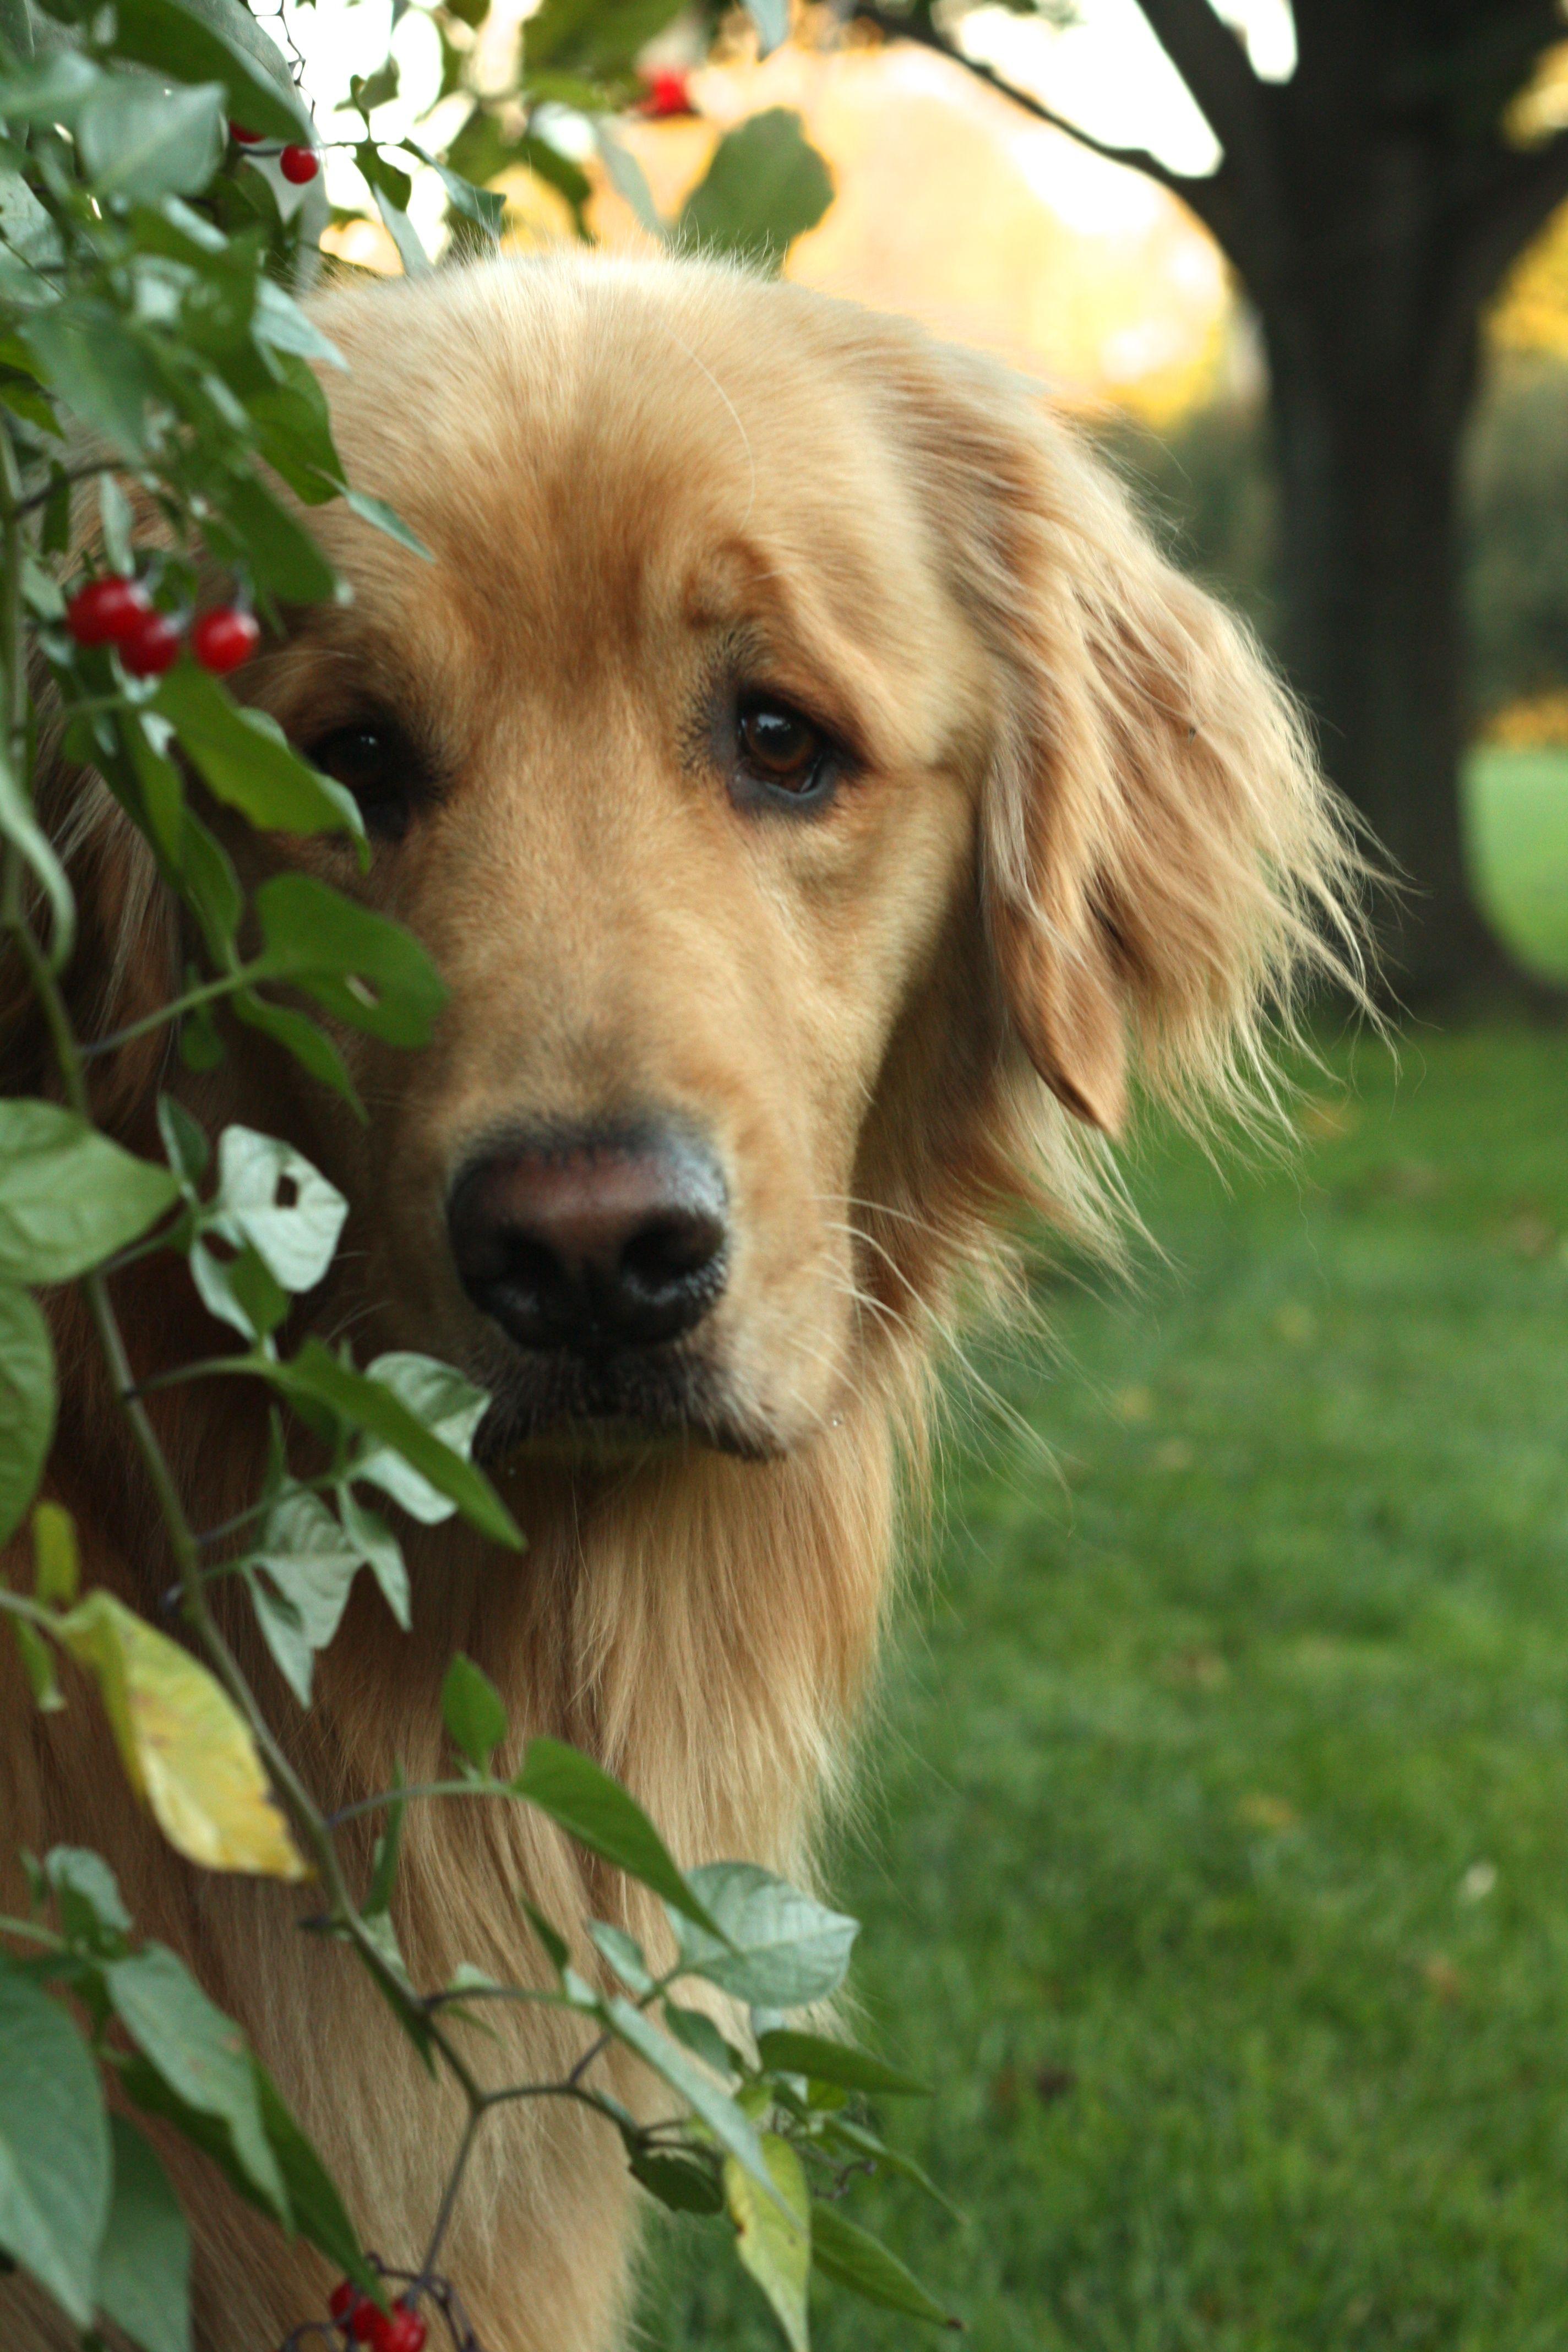 Essay in favor of dogs HElP!?